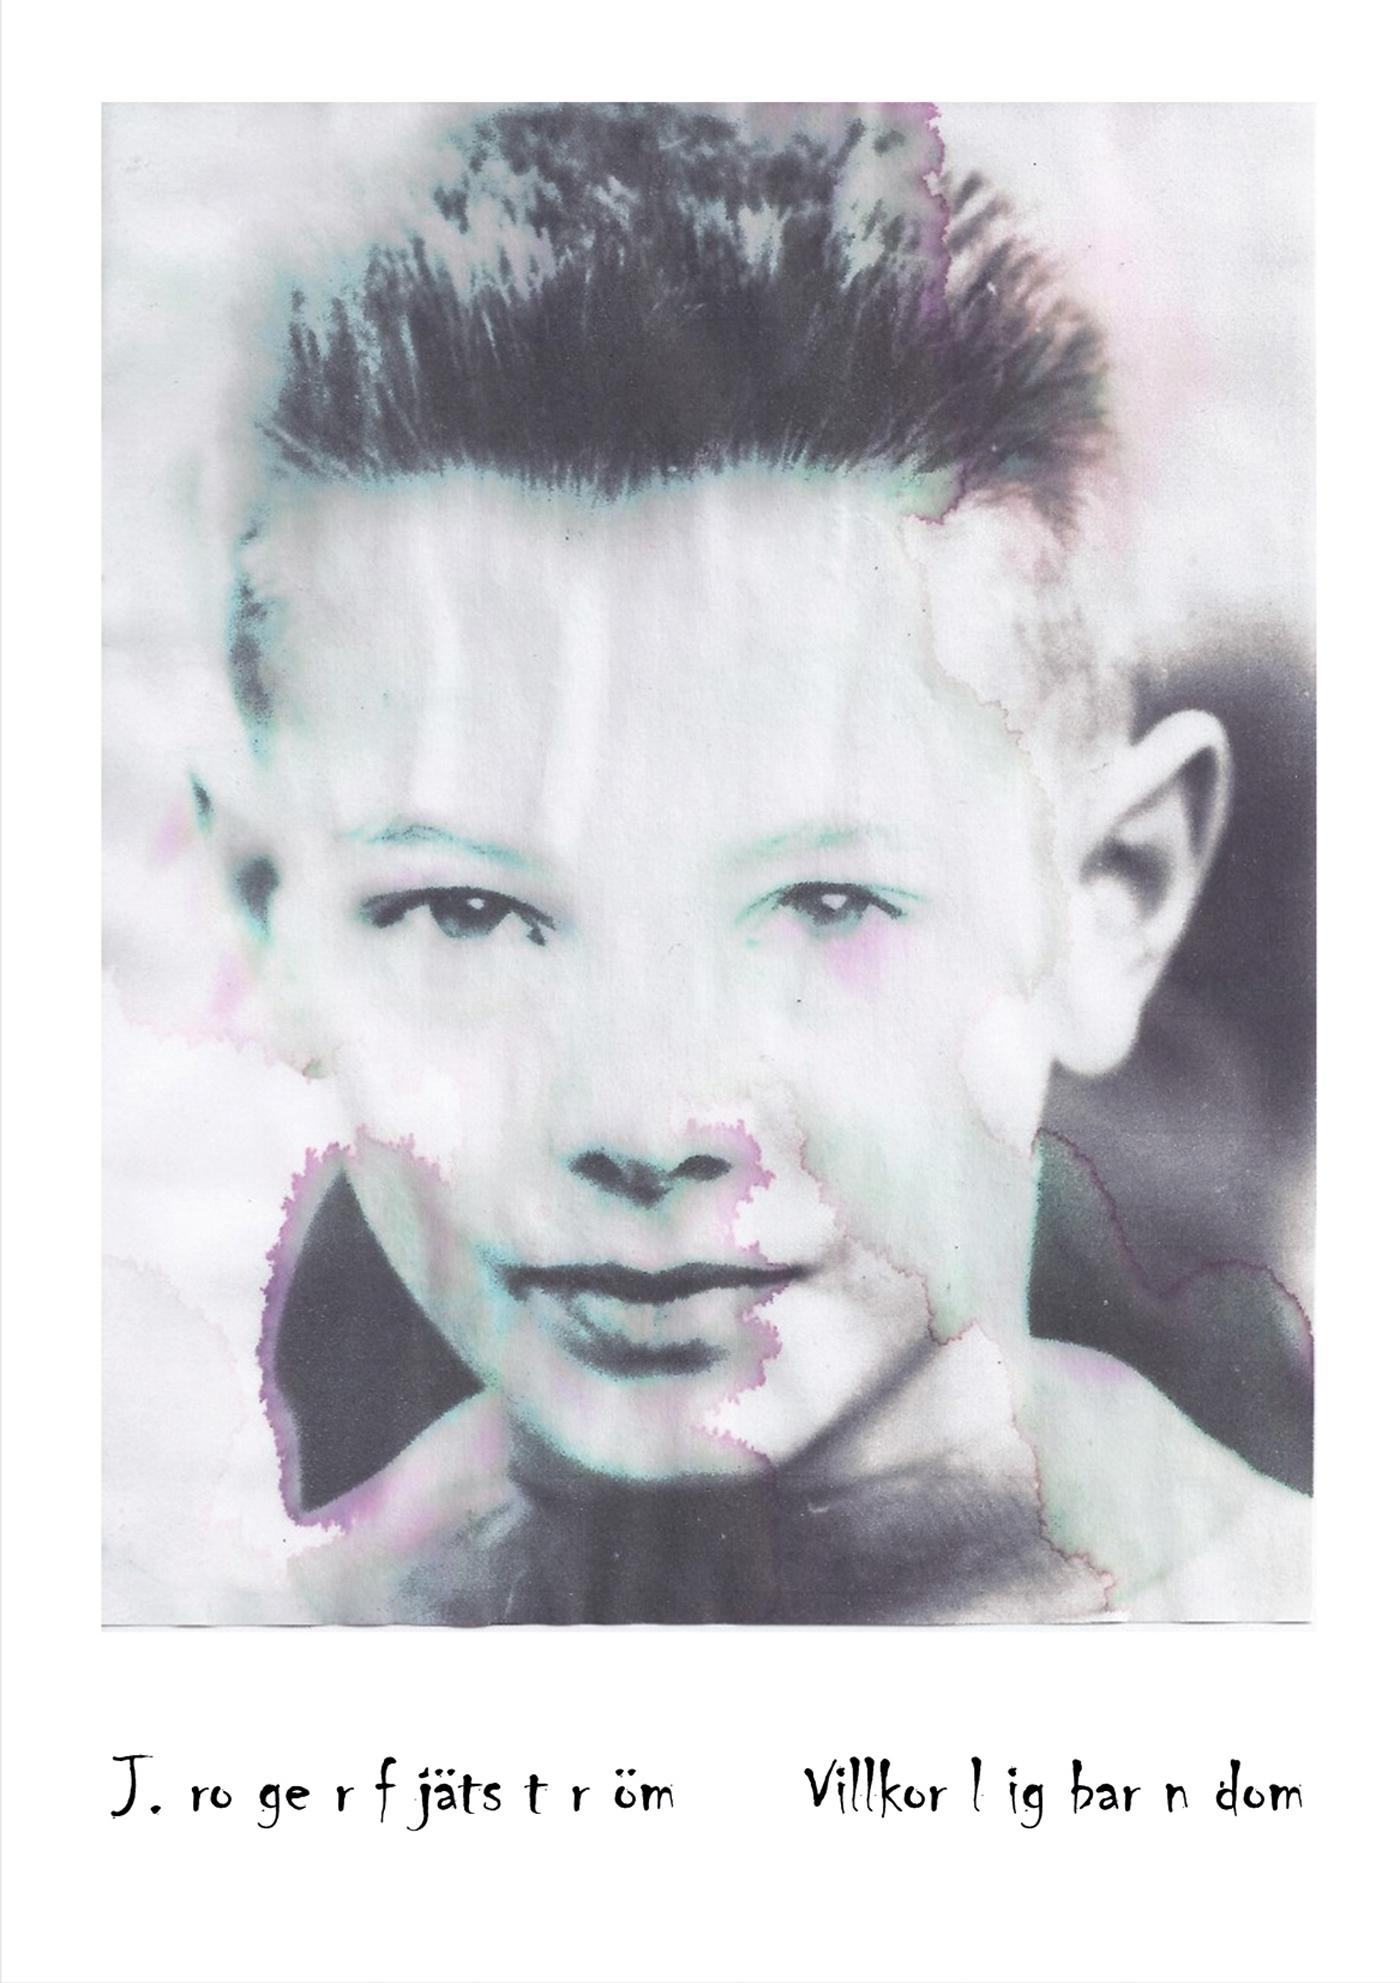 E-bok Villkorlig barndom : en memoaressä av Roger Fjellström